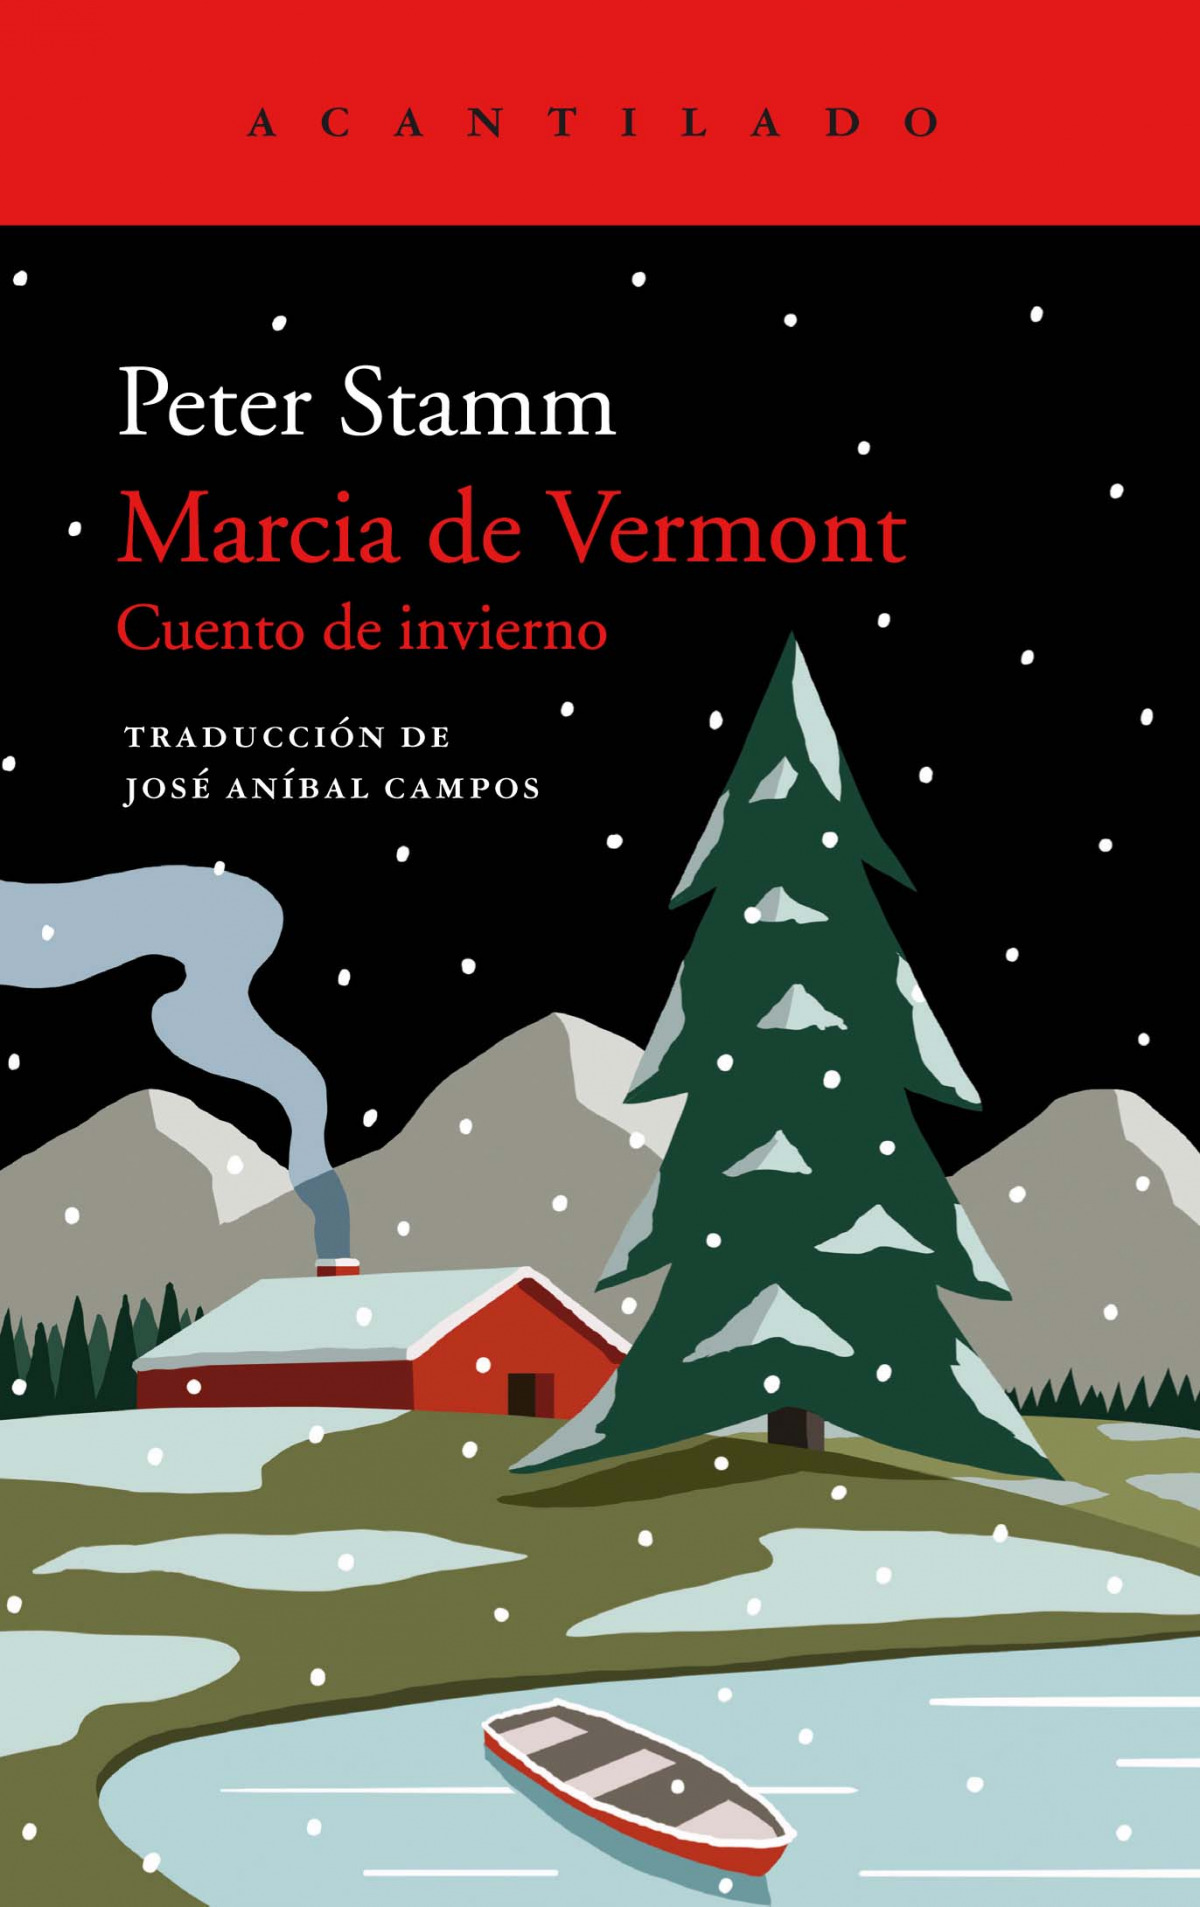 Marcia de Vermont